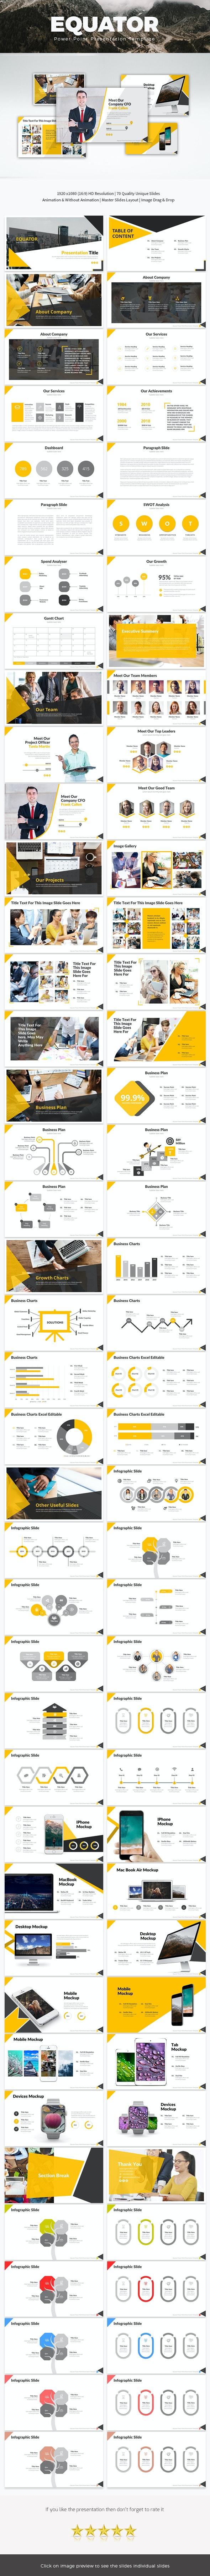 Equator Power Point Presentation - Business PowerPoint Templates